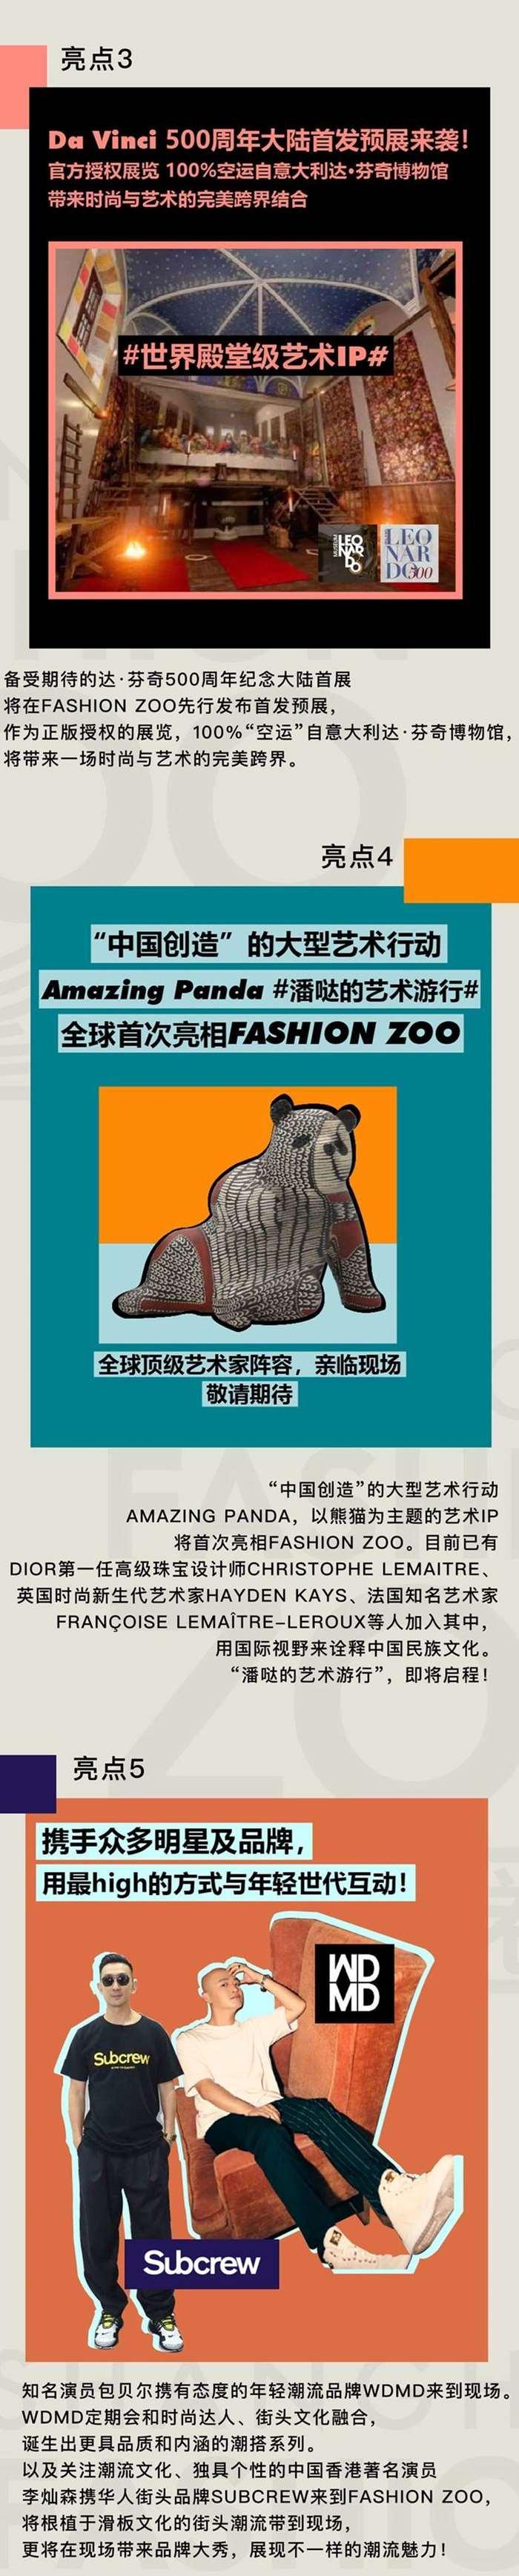 fashionzoo票务活动行 2.jpg